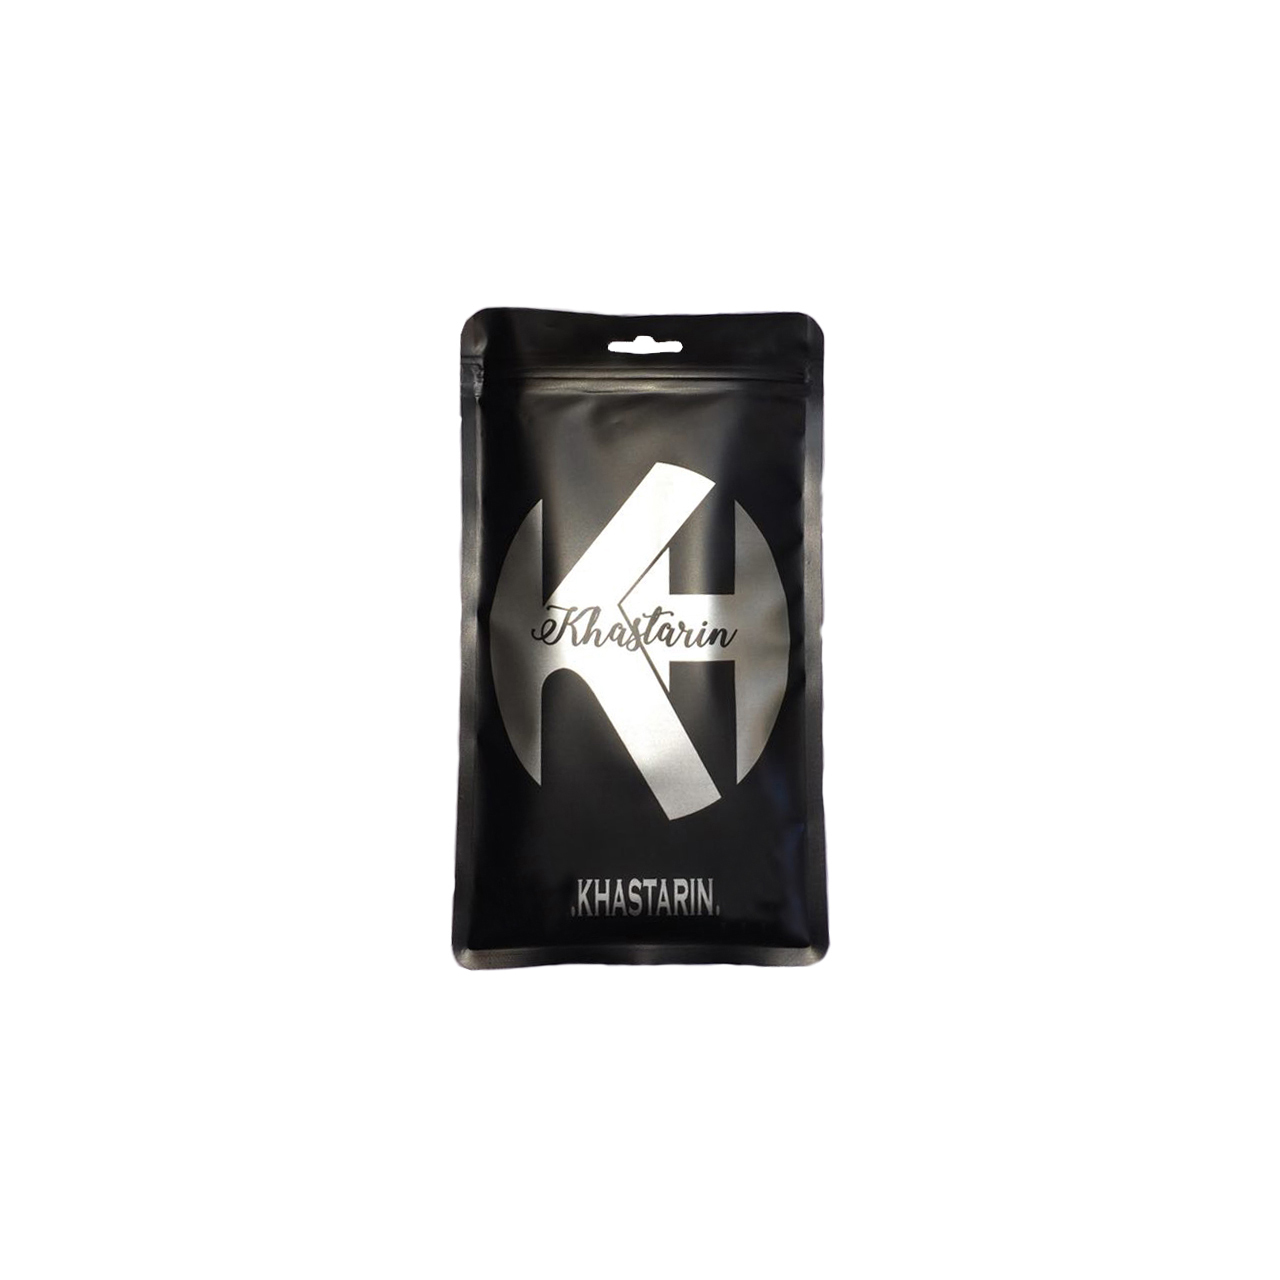 کاور کی اچ کد C19 مناسب برای گوشی موبایل سامسونگ galaxy S7 Edge